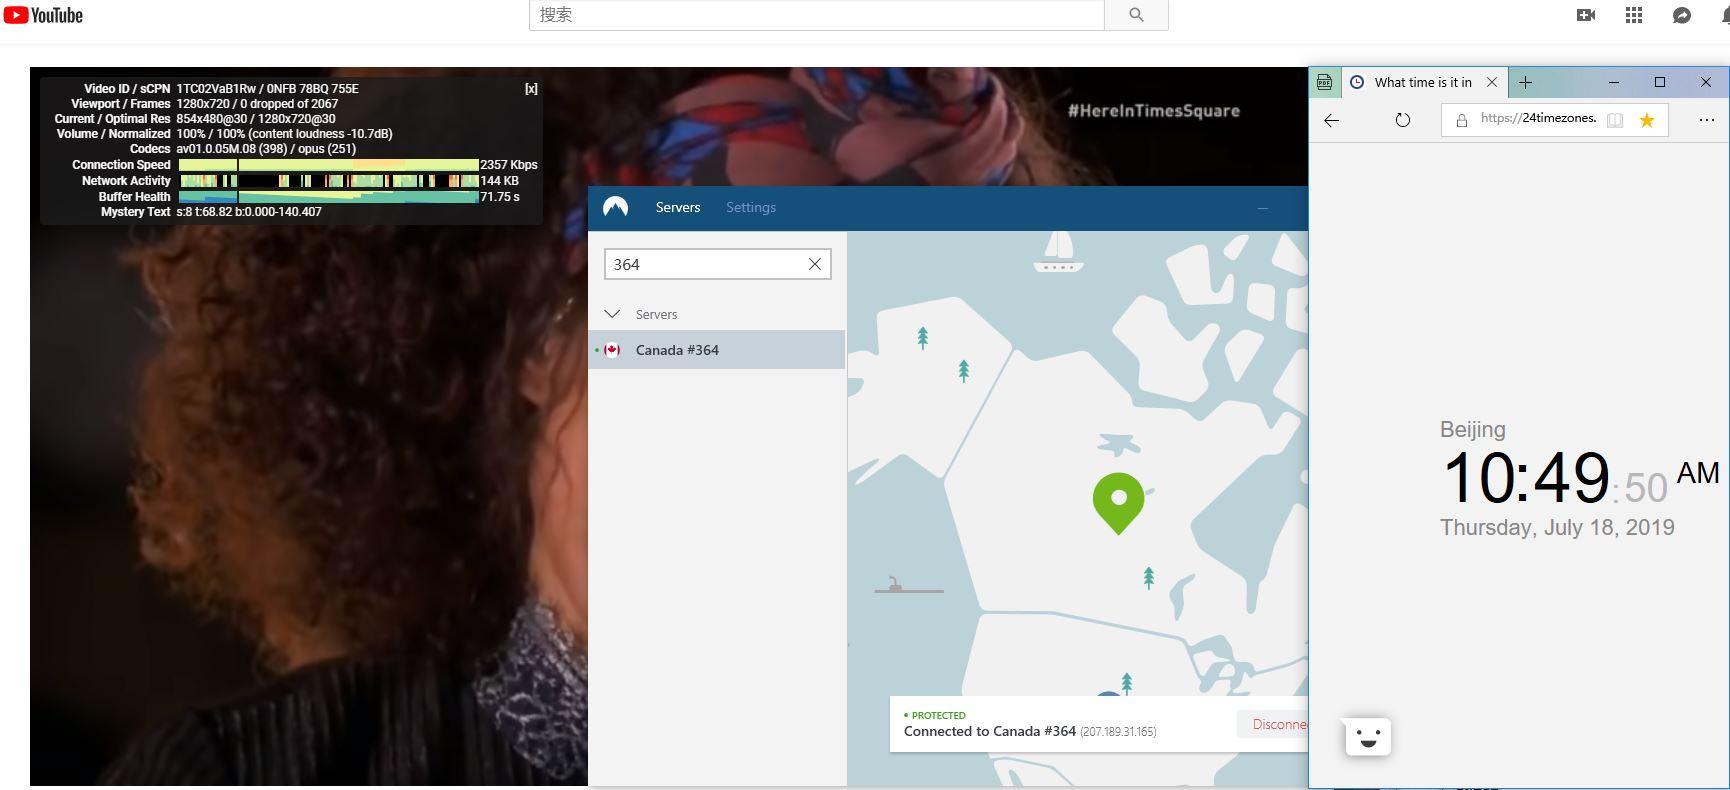 NordVPN Windows 翻墙 科学上午 加拿大-364服务器 YouTube速度测试-20190718